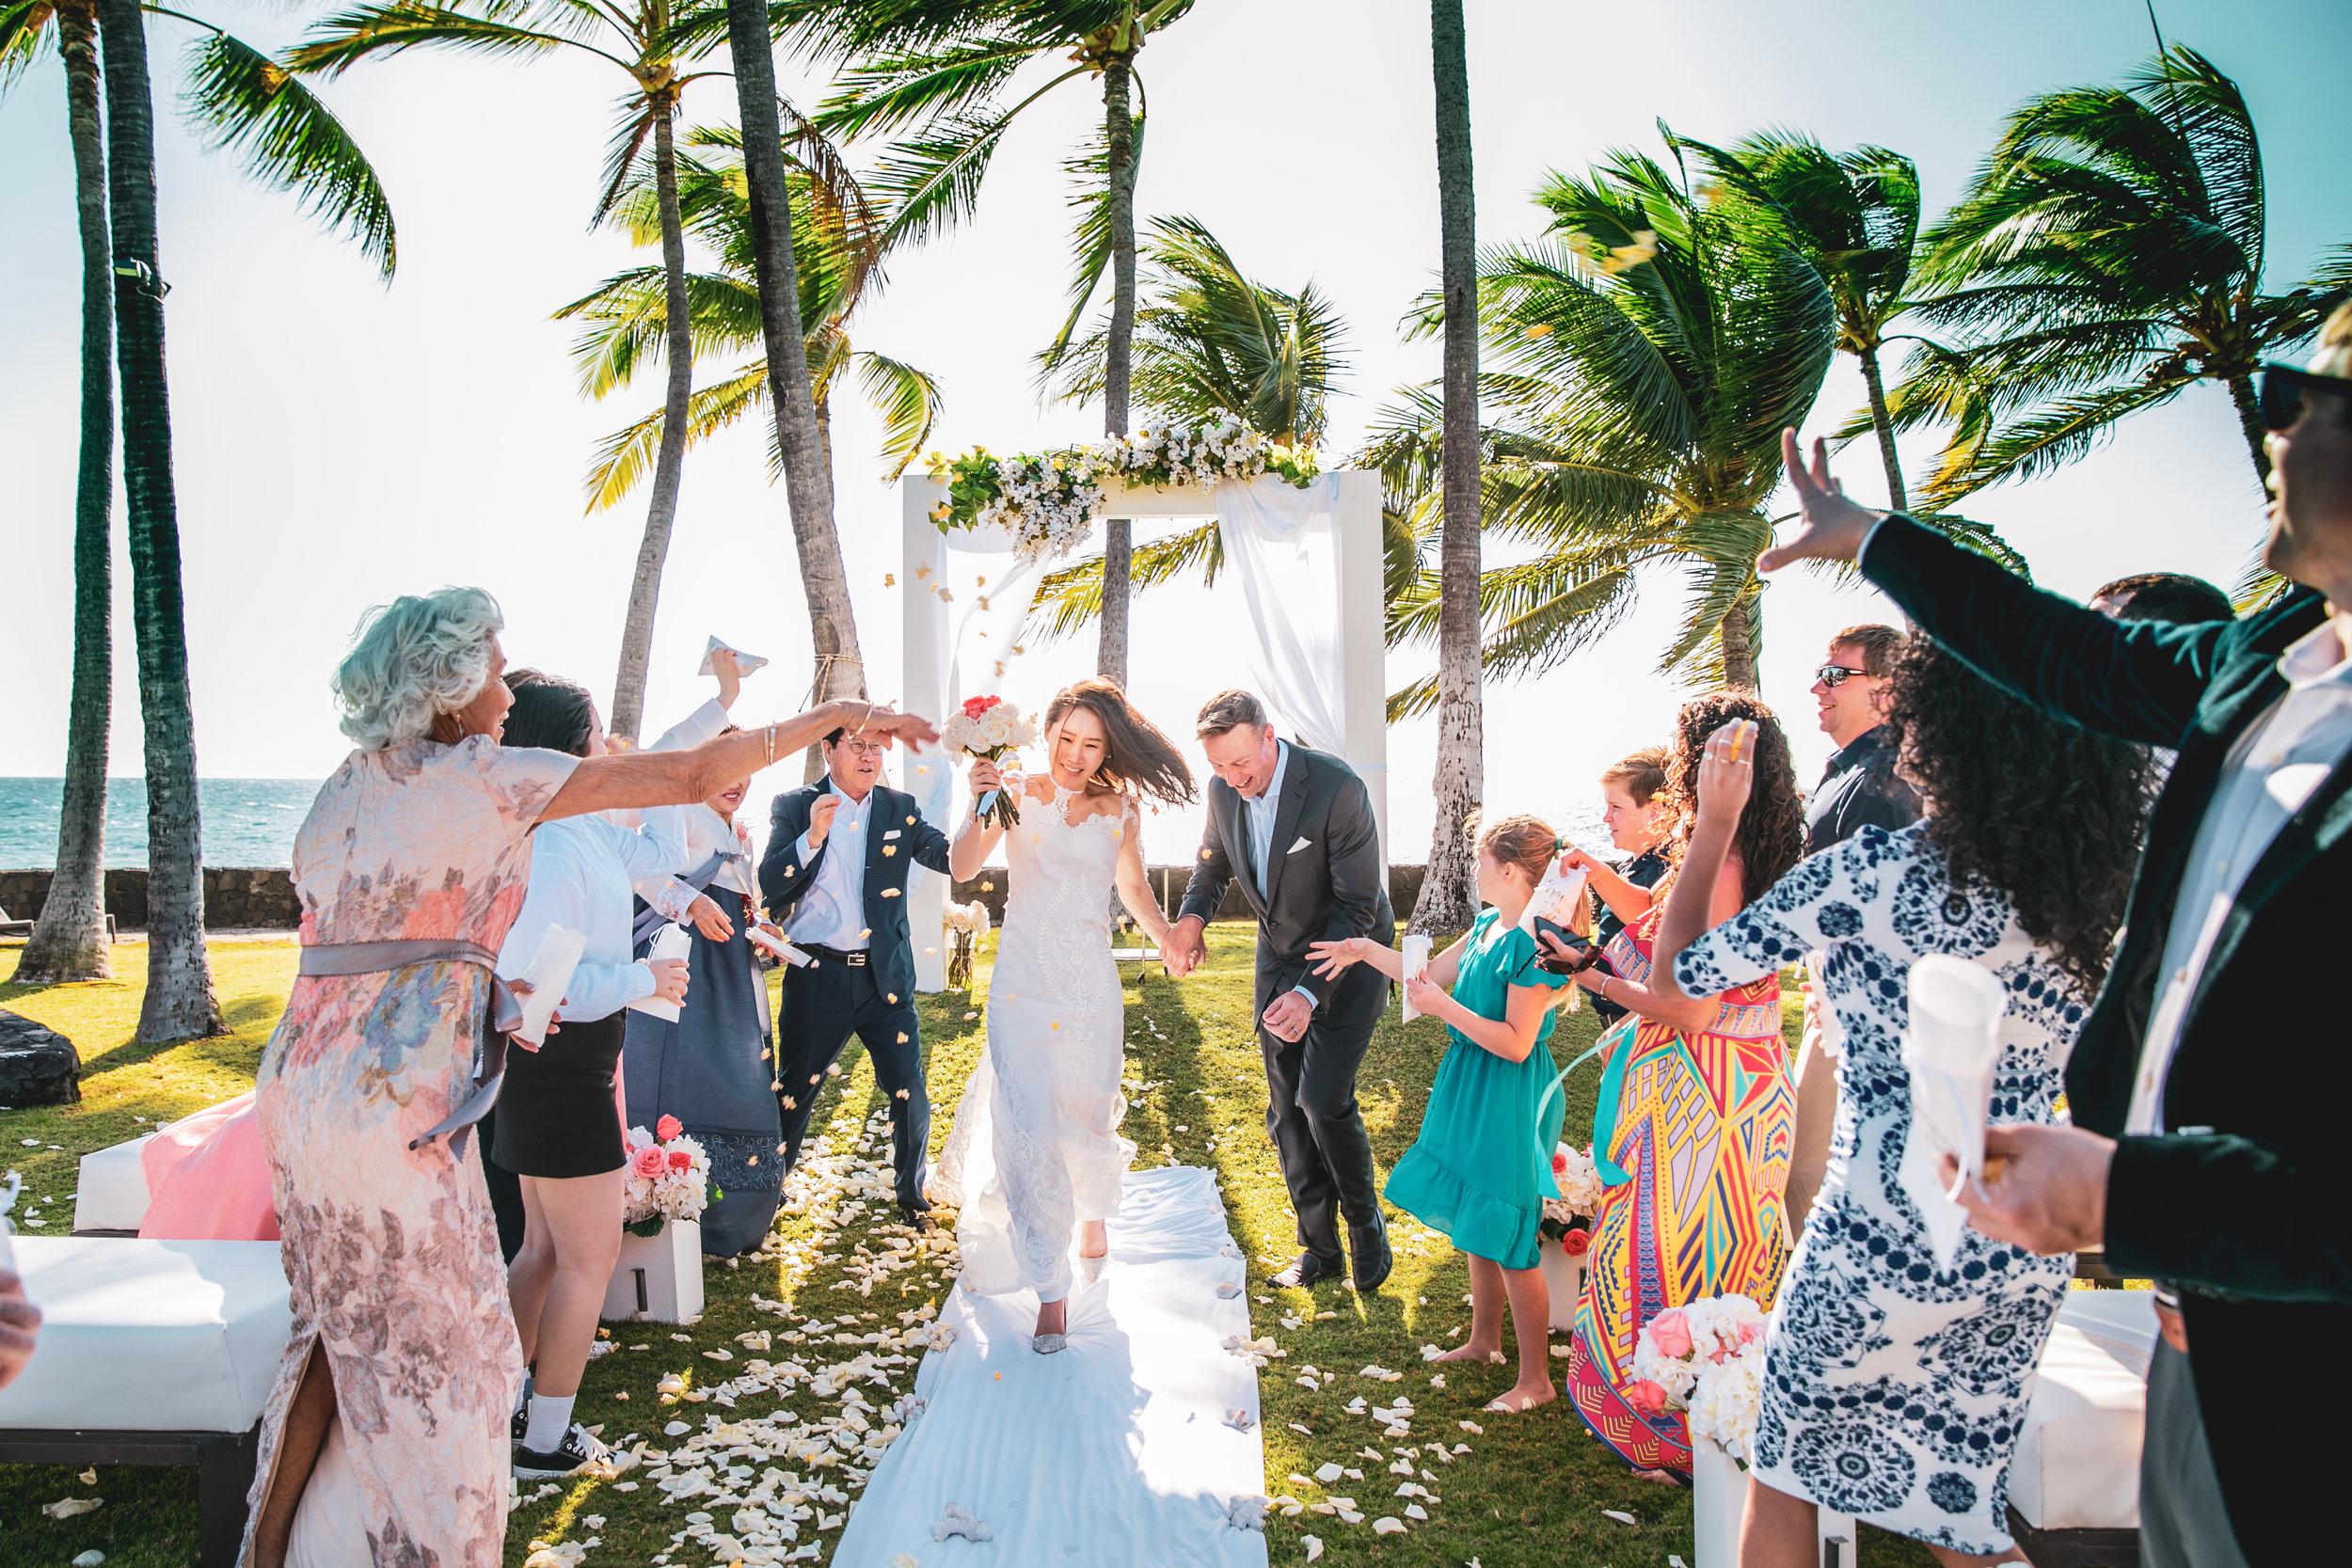 kelilina photography hawaii florida destination wedding photographer-40.jpg